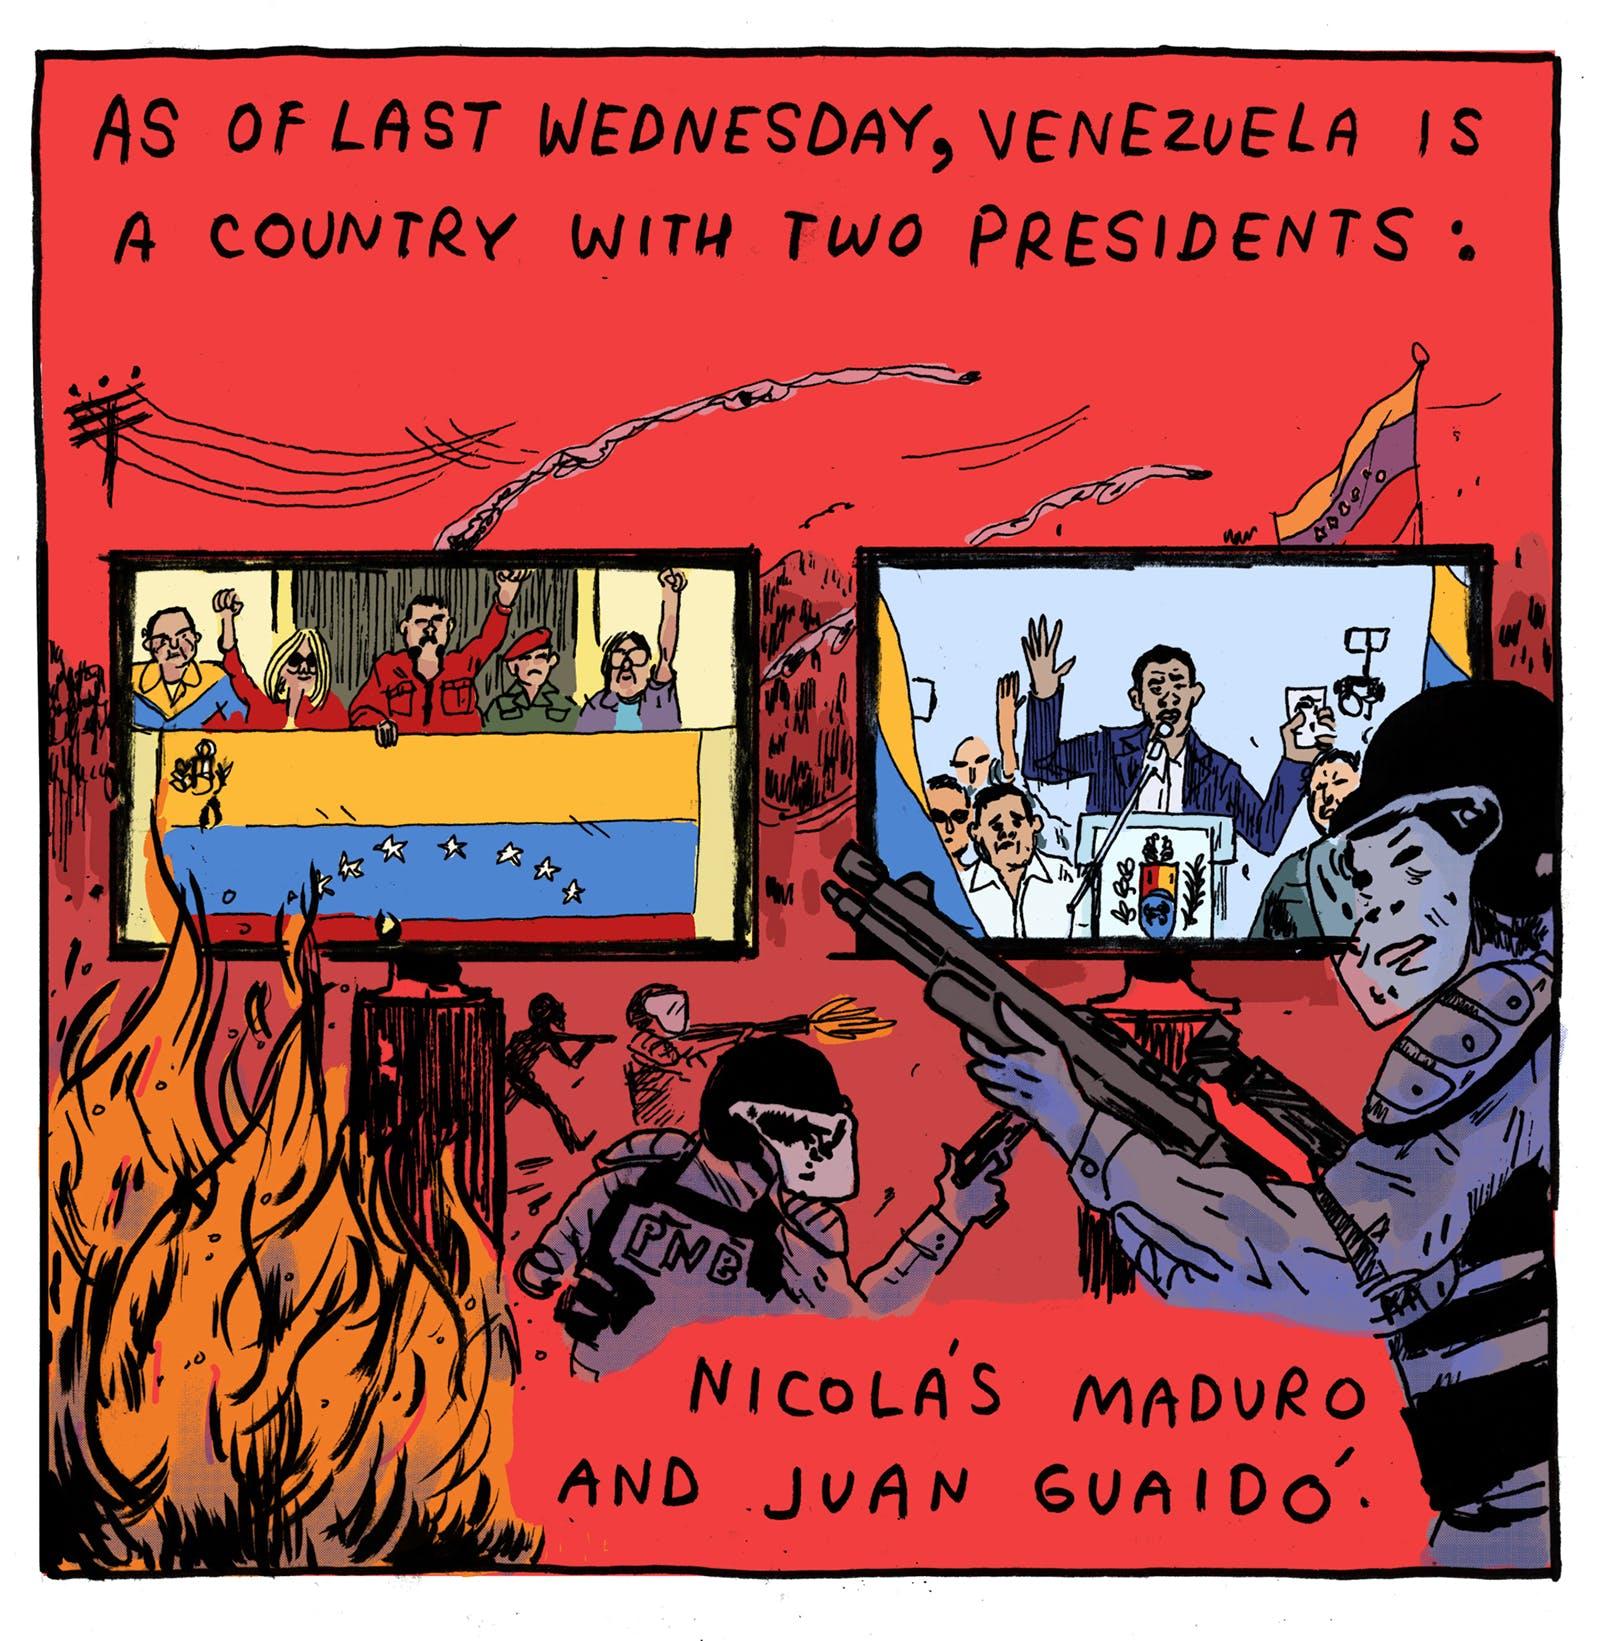 venezuela-s-two-presidents-1-dce